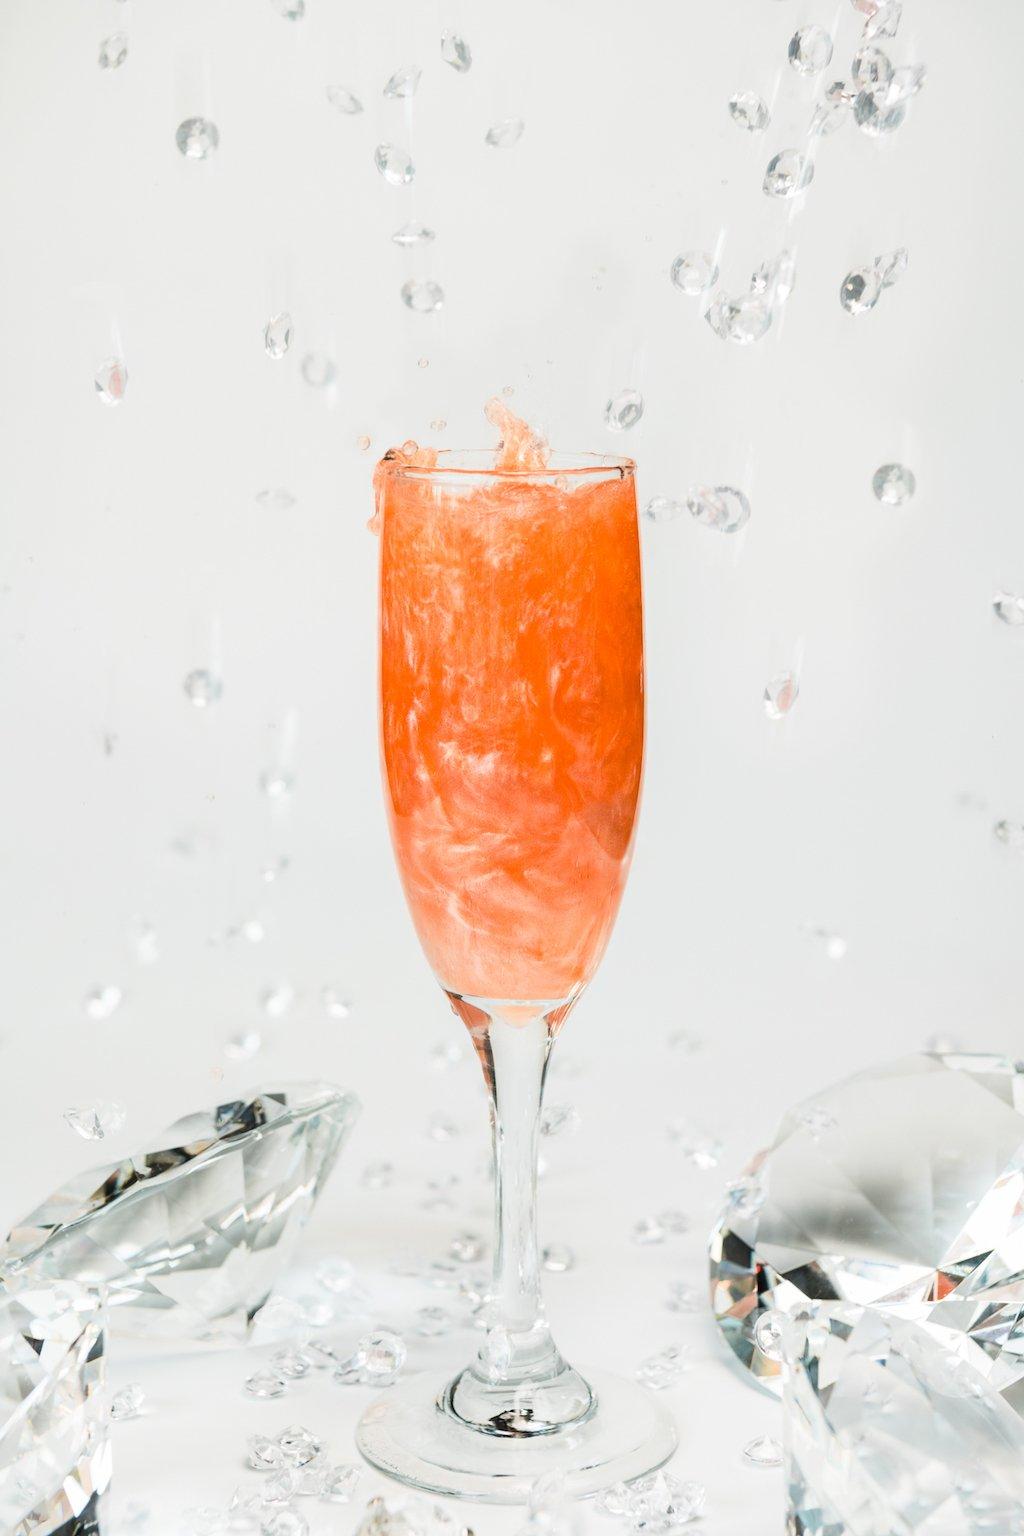 Royal wedding pop-up bar, Prince Harry, Meghan Markle, Drink Company, DC